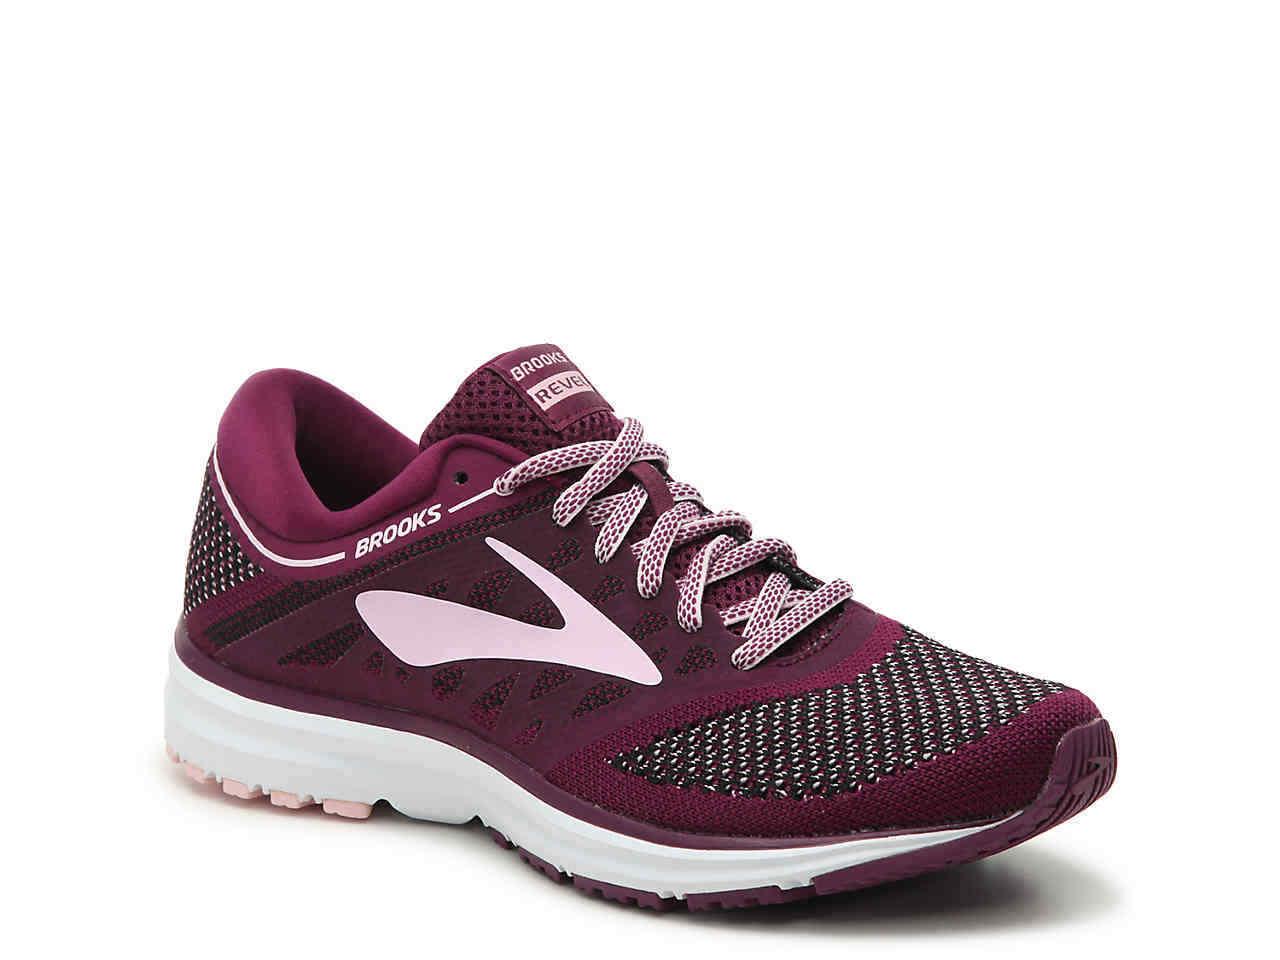 7363cb741296b Details about Brooks Women s Revel 120249-1B-598 Plum Pink Black Running  Sneakers